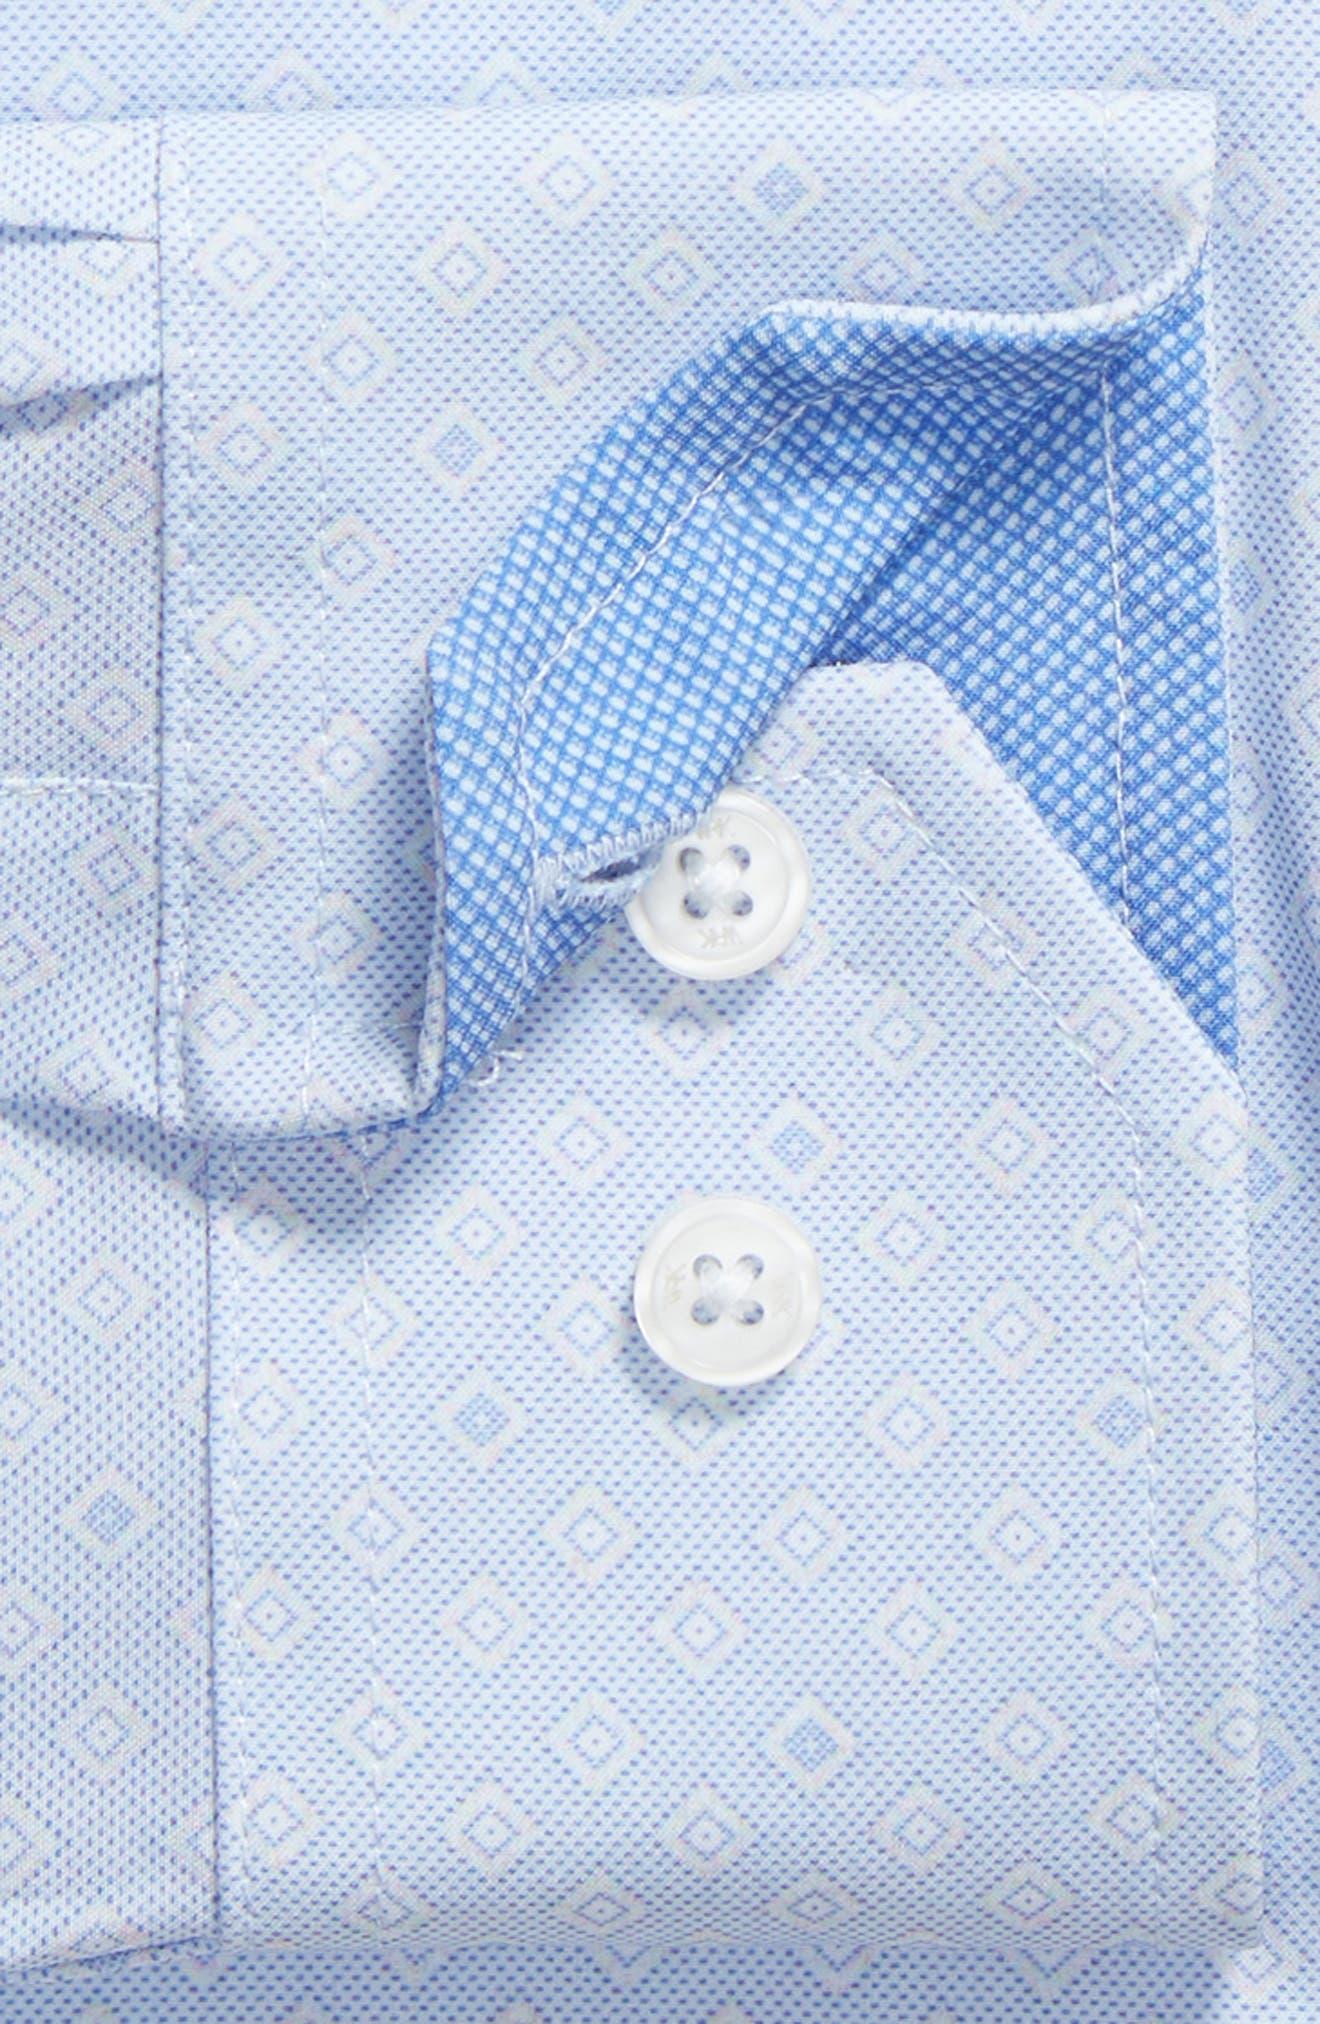 Trim Fit Geometric 4-Way Stretch Dress Shirt,                             Alternate thumbnail 6, color,                             BLUE